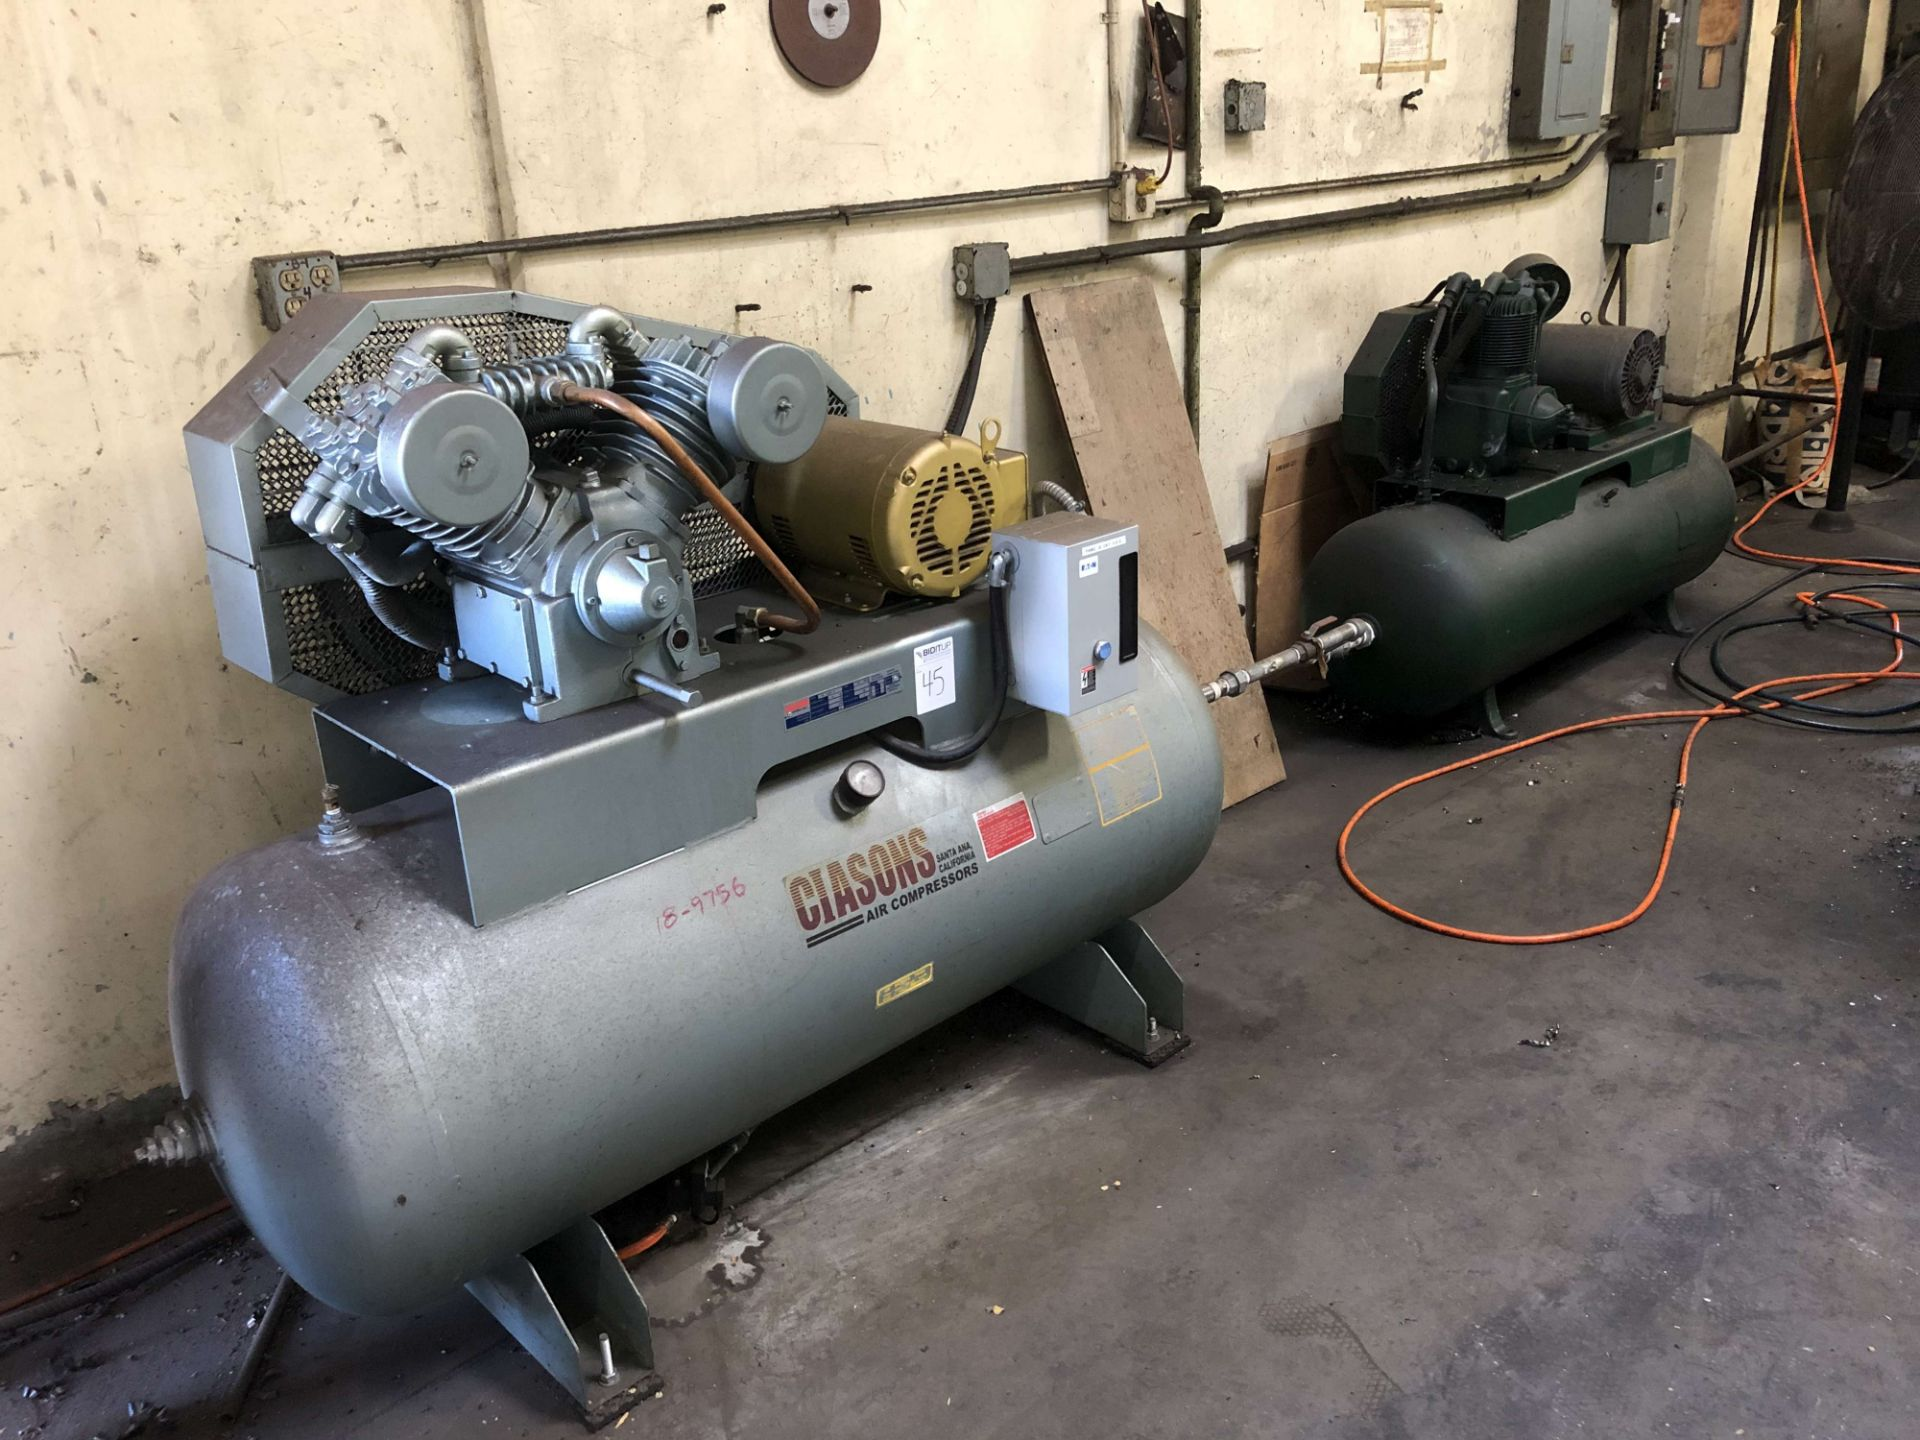 Lot 45 - 2018 Ciasons 10 HP Air Compressor, Model TS-B1012HDAE32, 120 Gallon Horizontal Tank, 40 CFM, 150